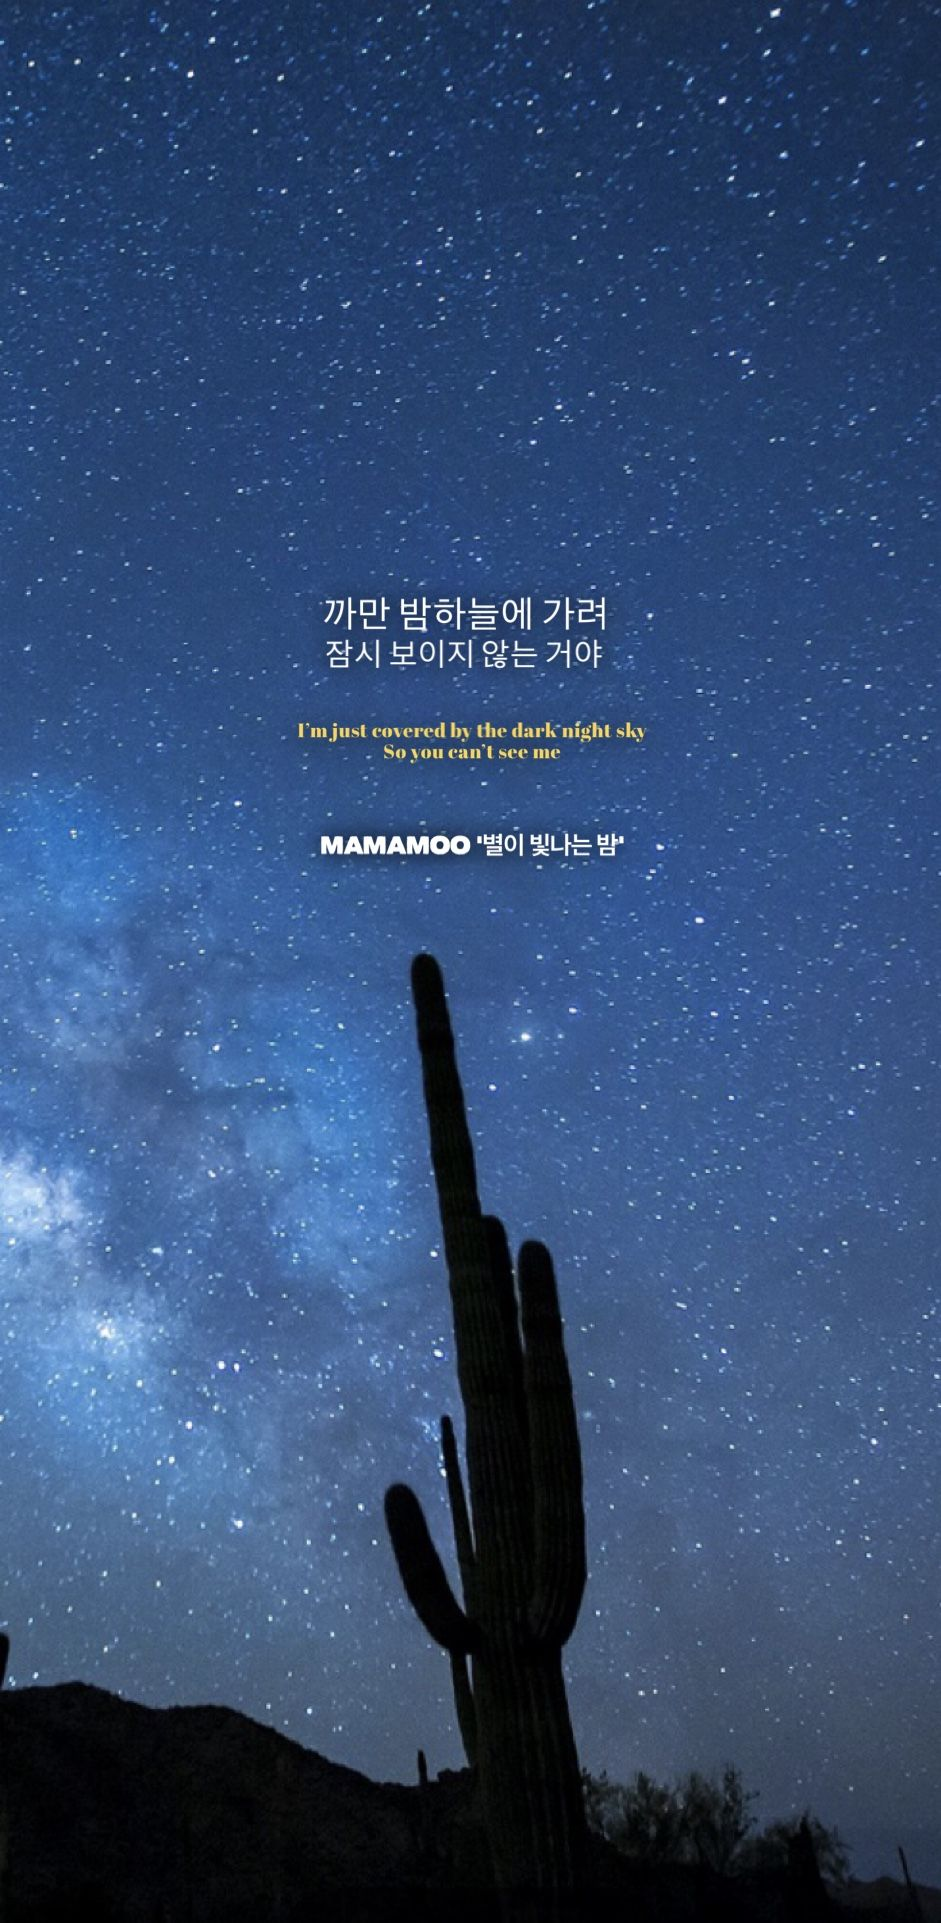 Pin On Mamamoo Lyrics Wallpaper